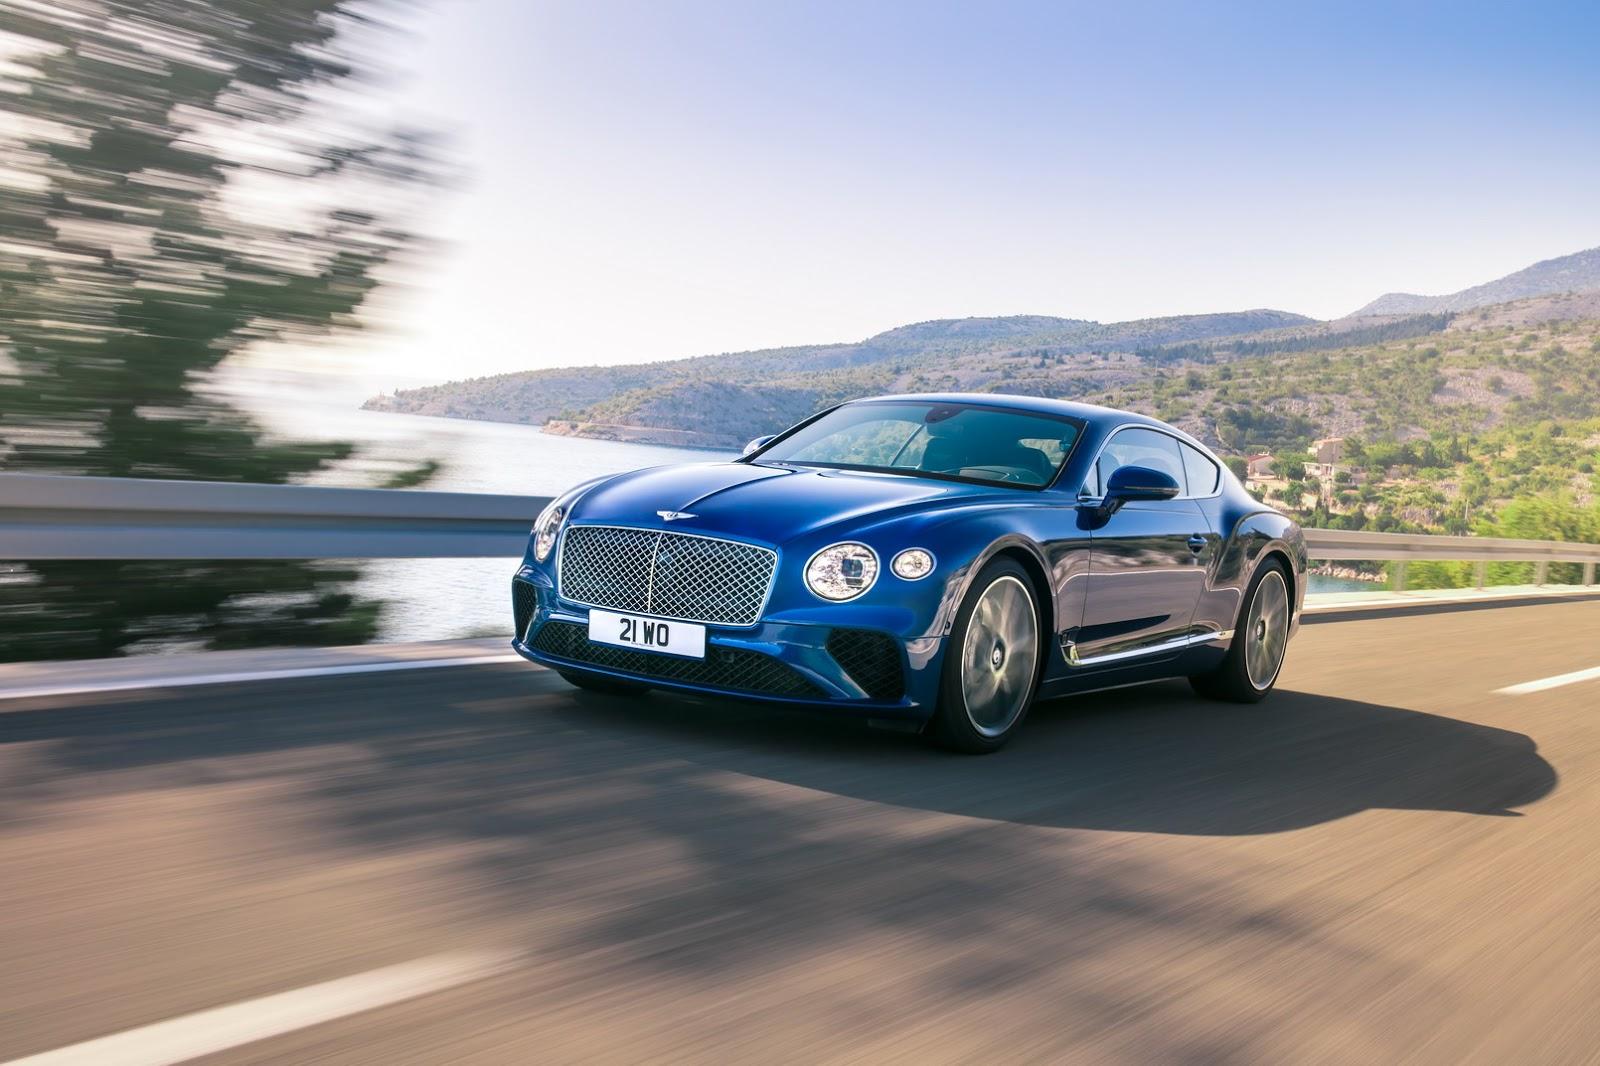 2018 Bentley Continental Gt Conti Talk Mycarforum Com